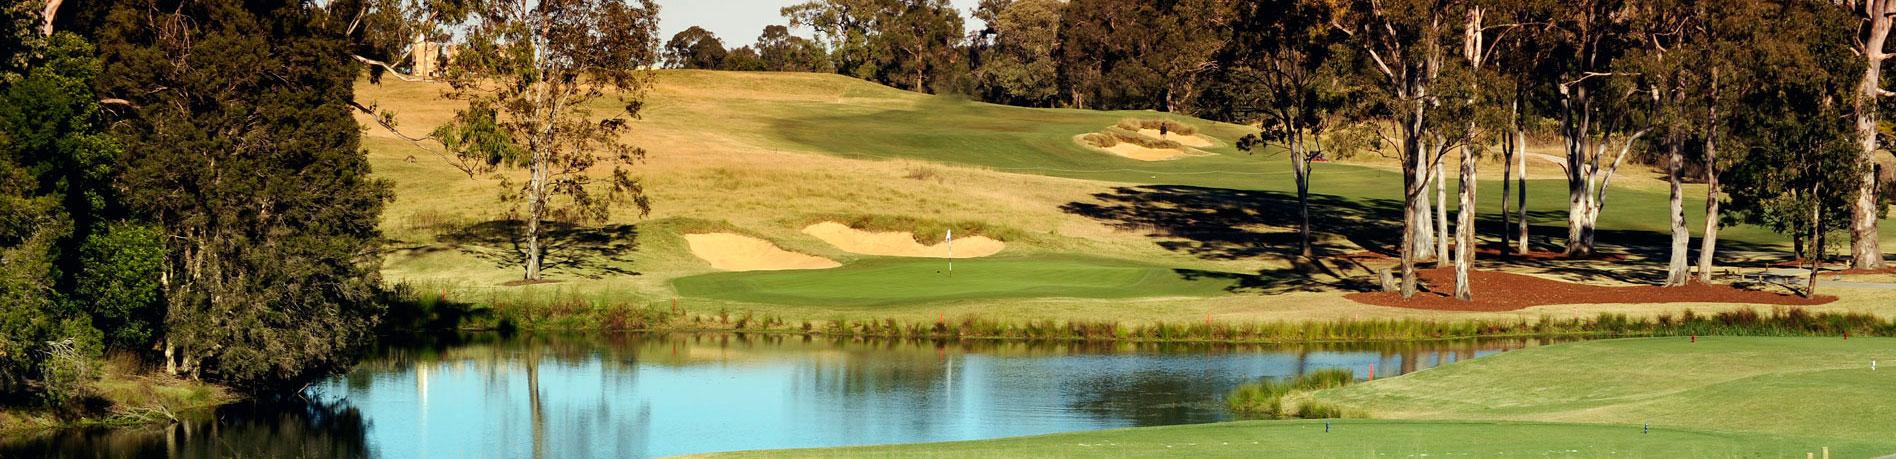 Day 6. Riverside Golf Club